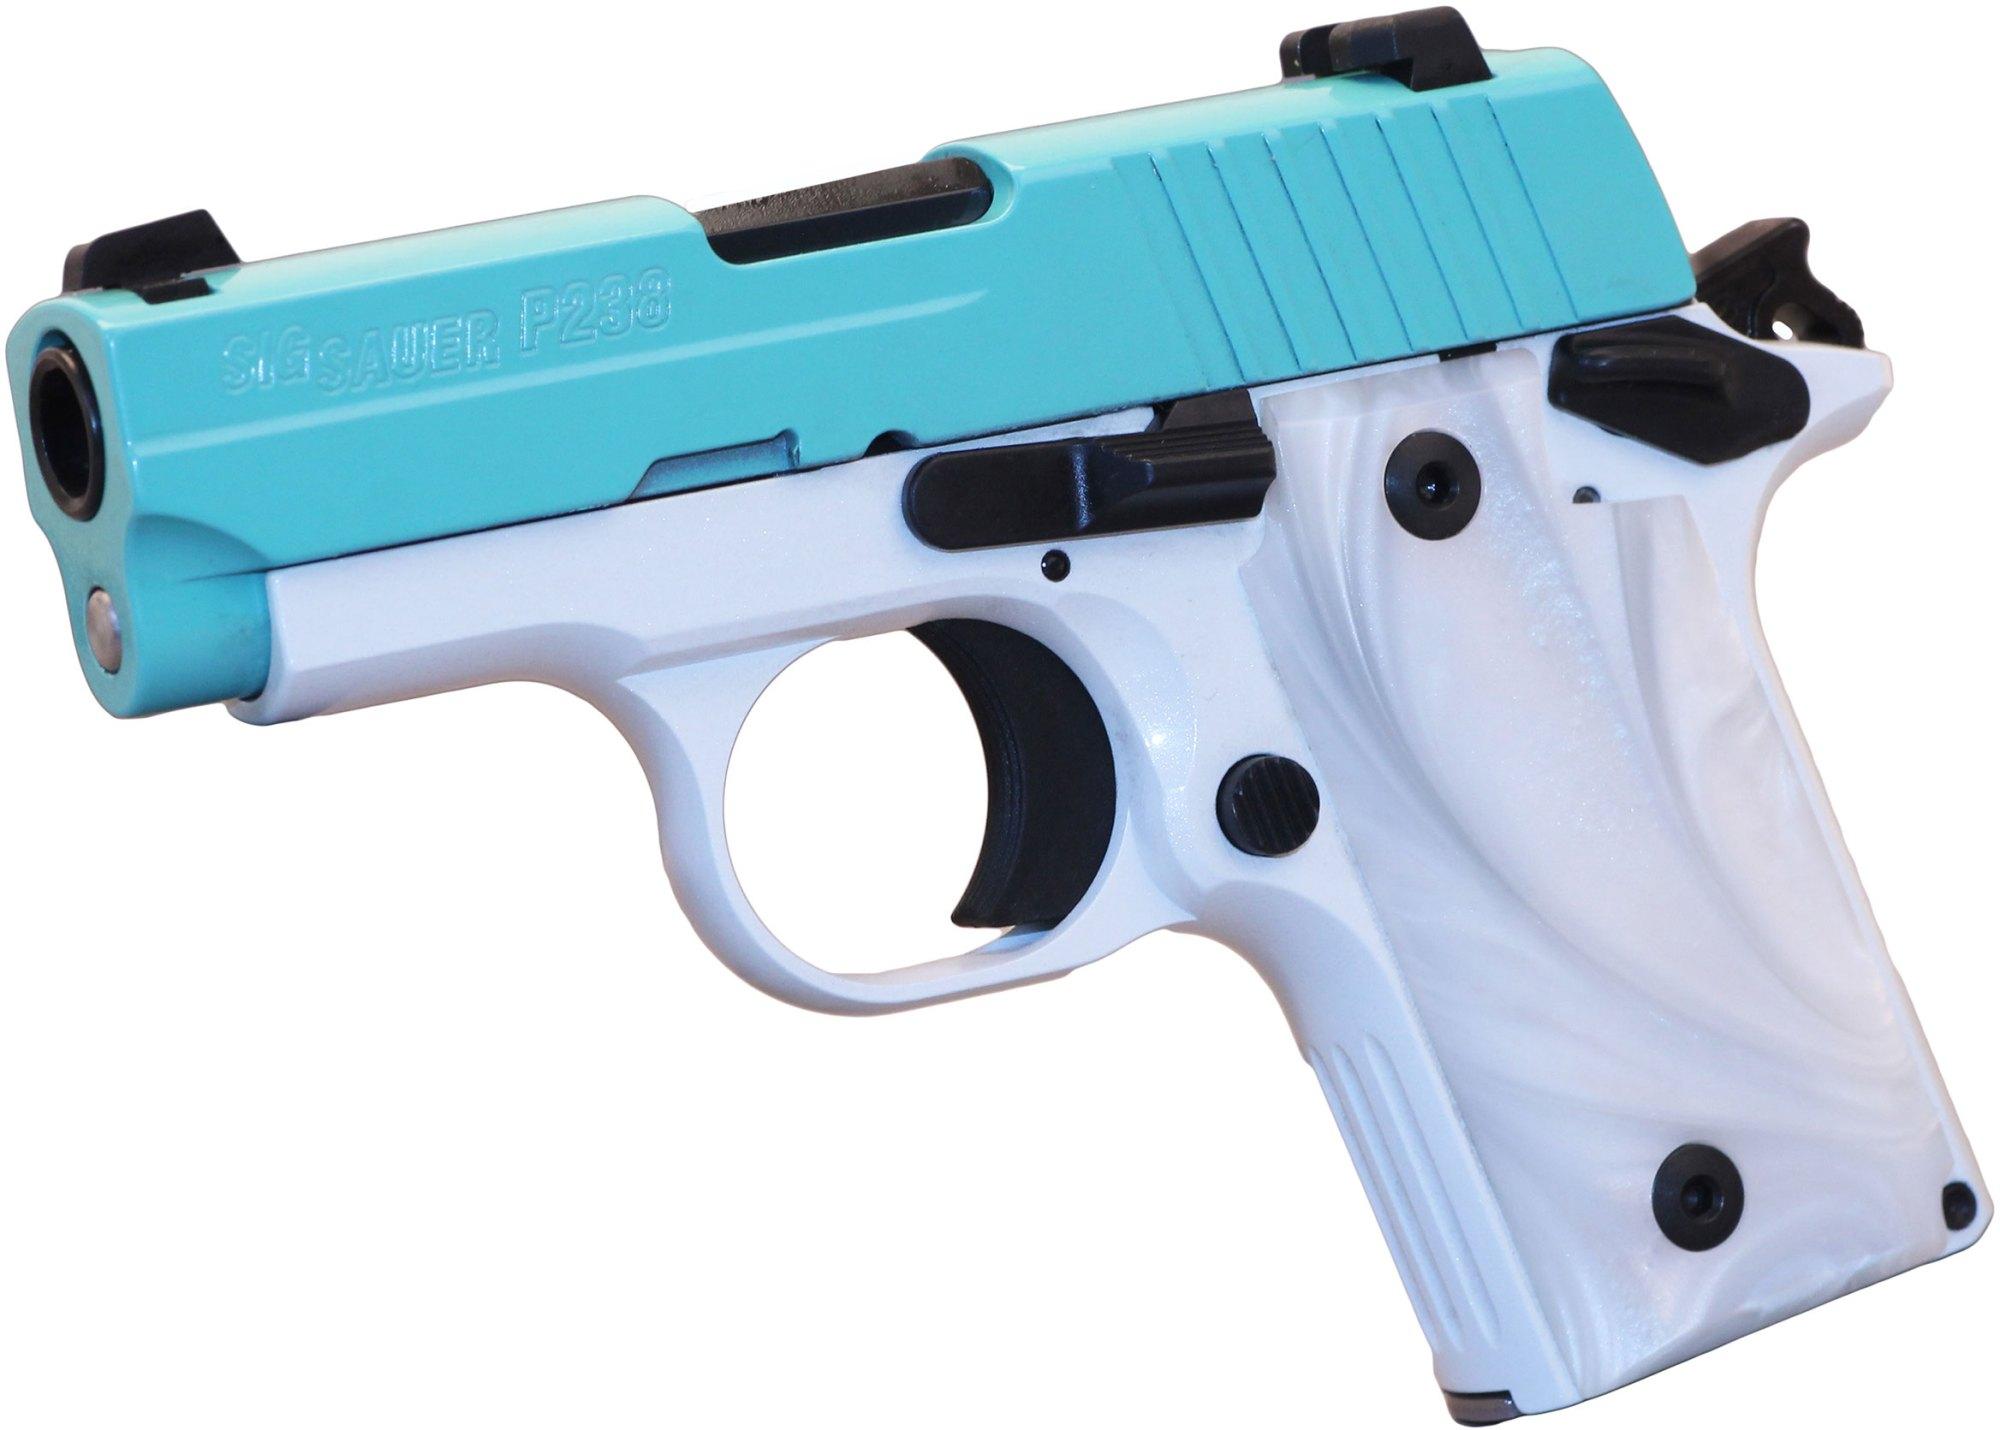 hight resolution of sig p238 pistol 238 380 tsw 380 acp pistol 2 7 in white pearl grips pearl white frame w robins egg blue slide 6 rd